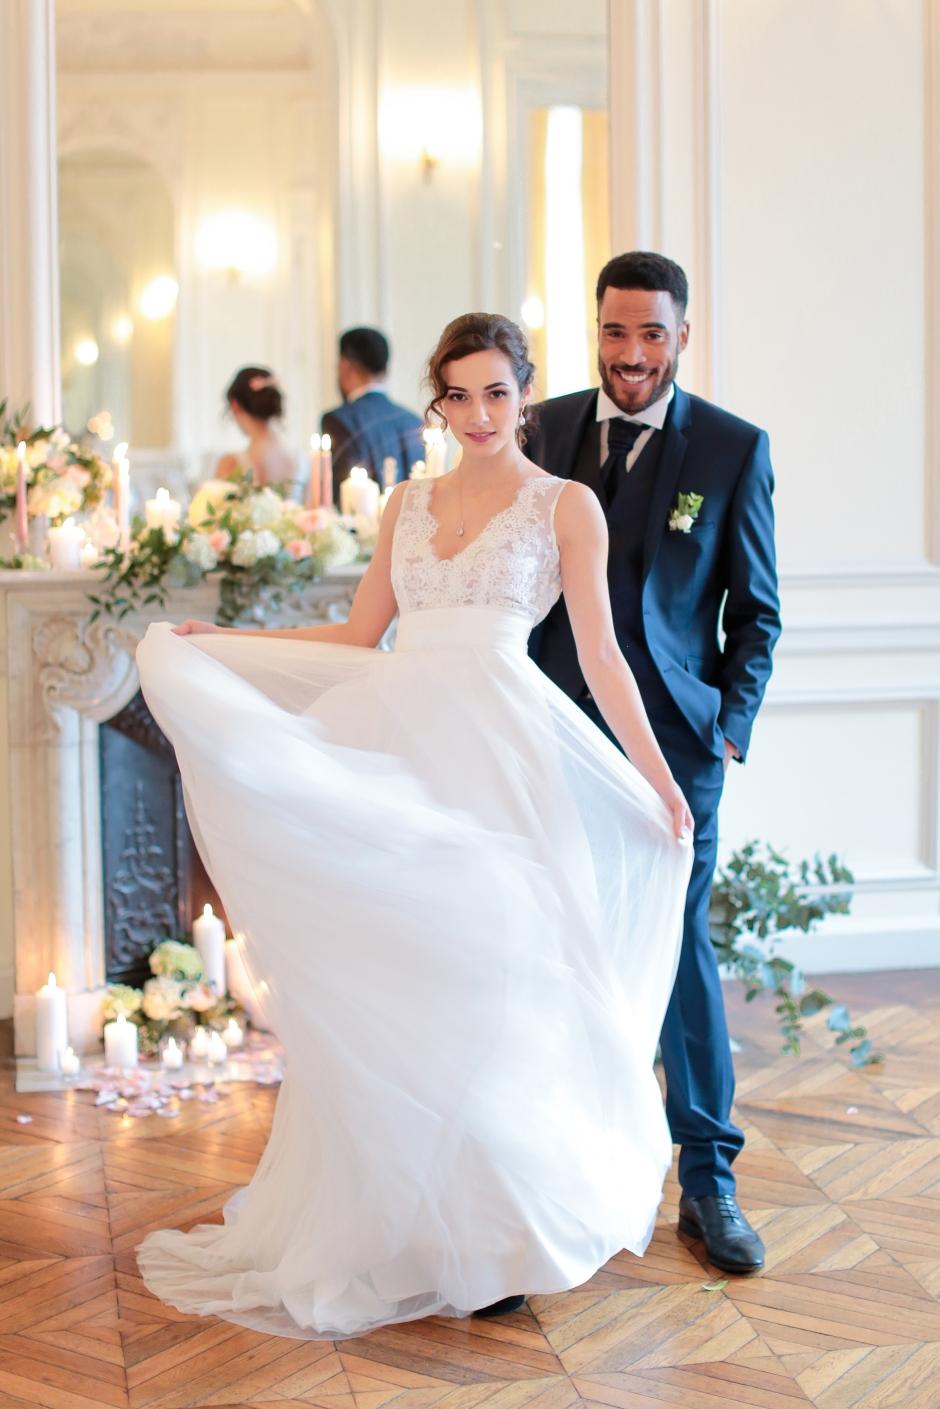 Mariage nude au Chateau de Santeny - La Blogueuse Mariage (9)